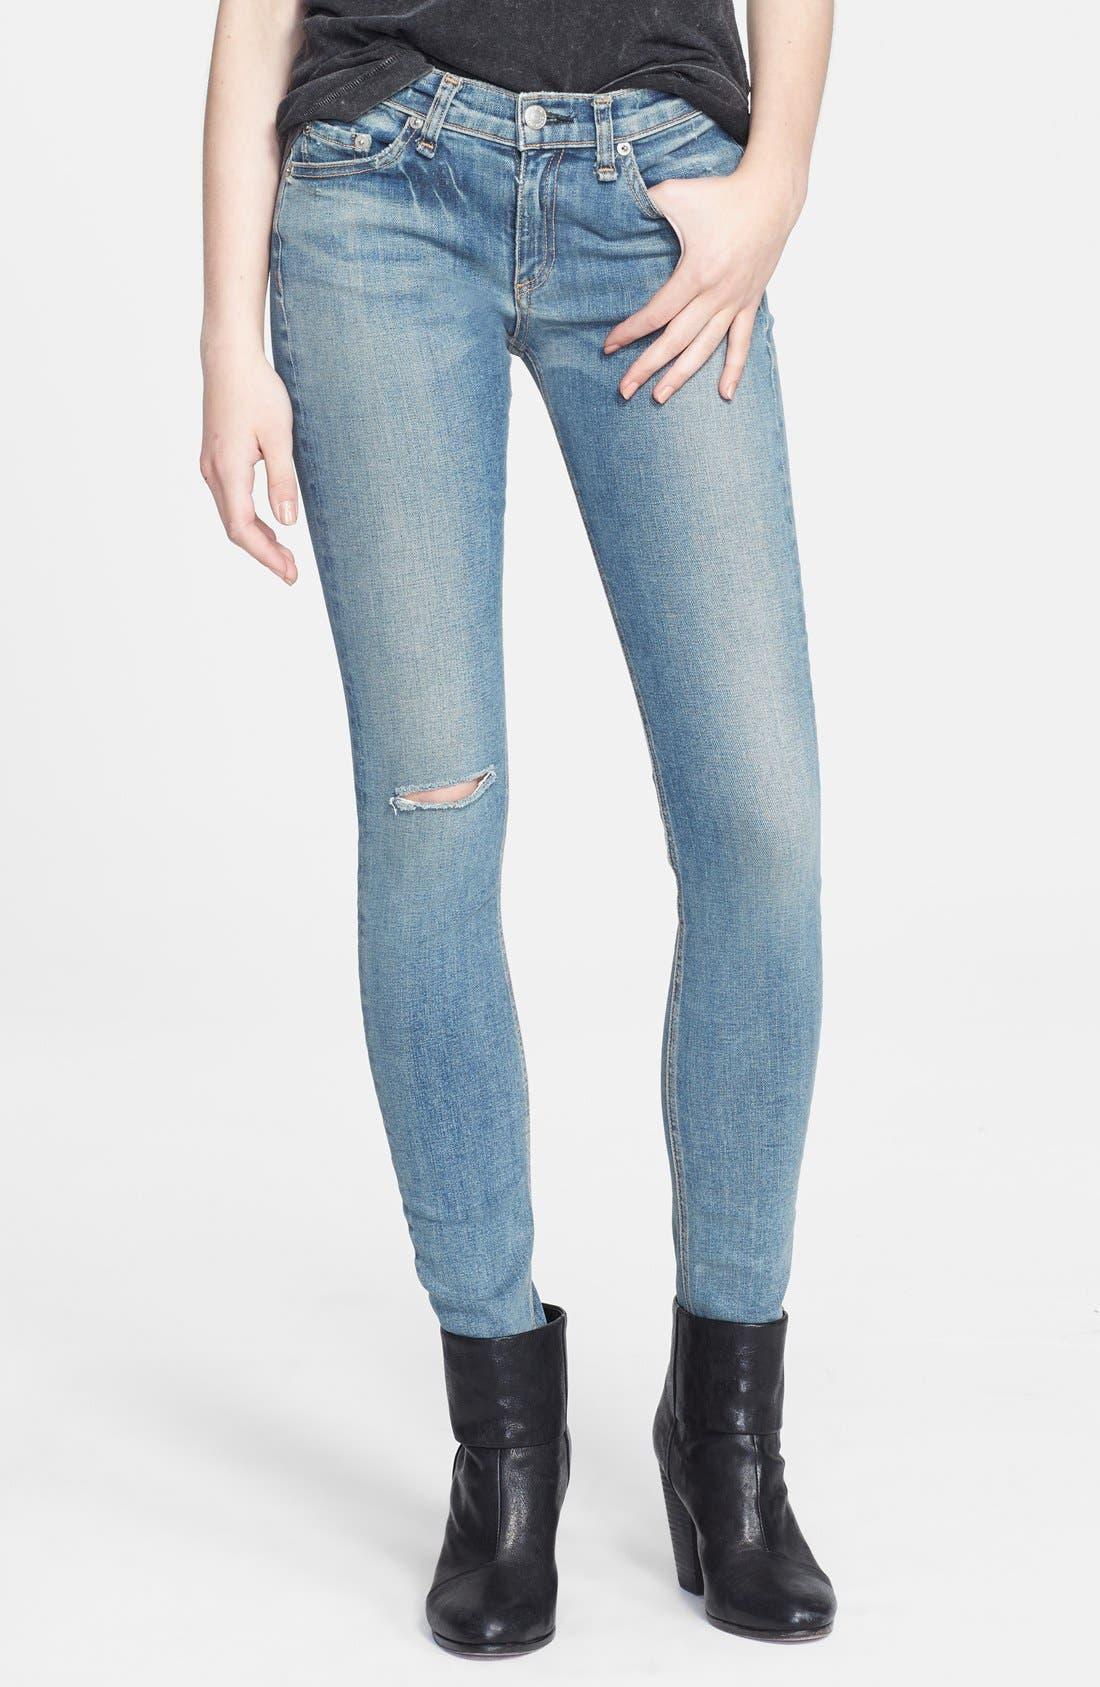 Alternate Image 1 Selected - rag & bone/JEAN Stretch Skinny Jeans (Water Street)